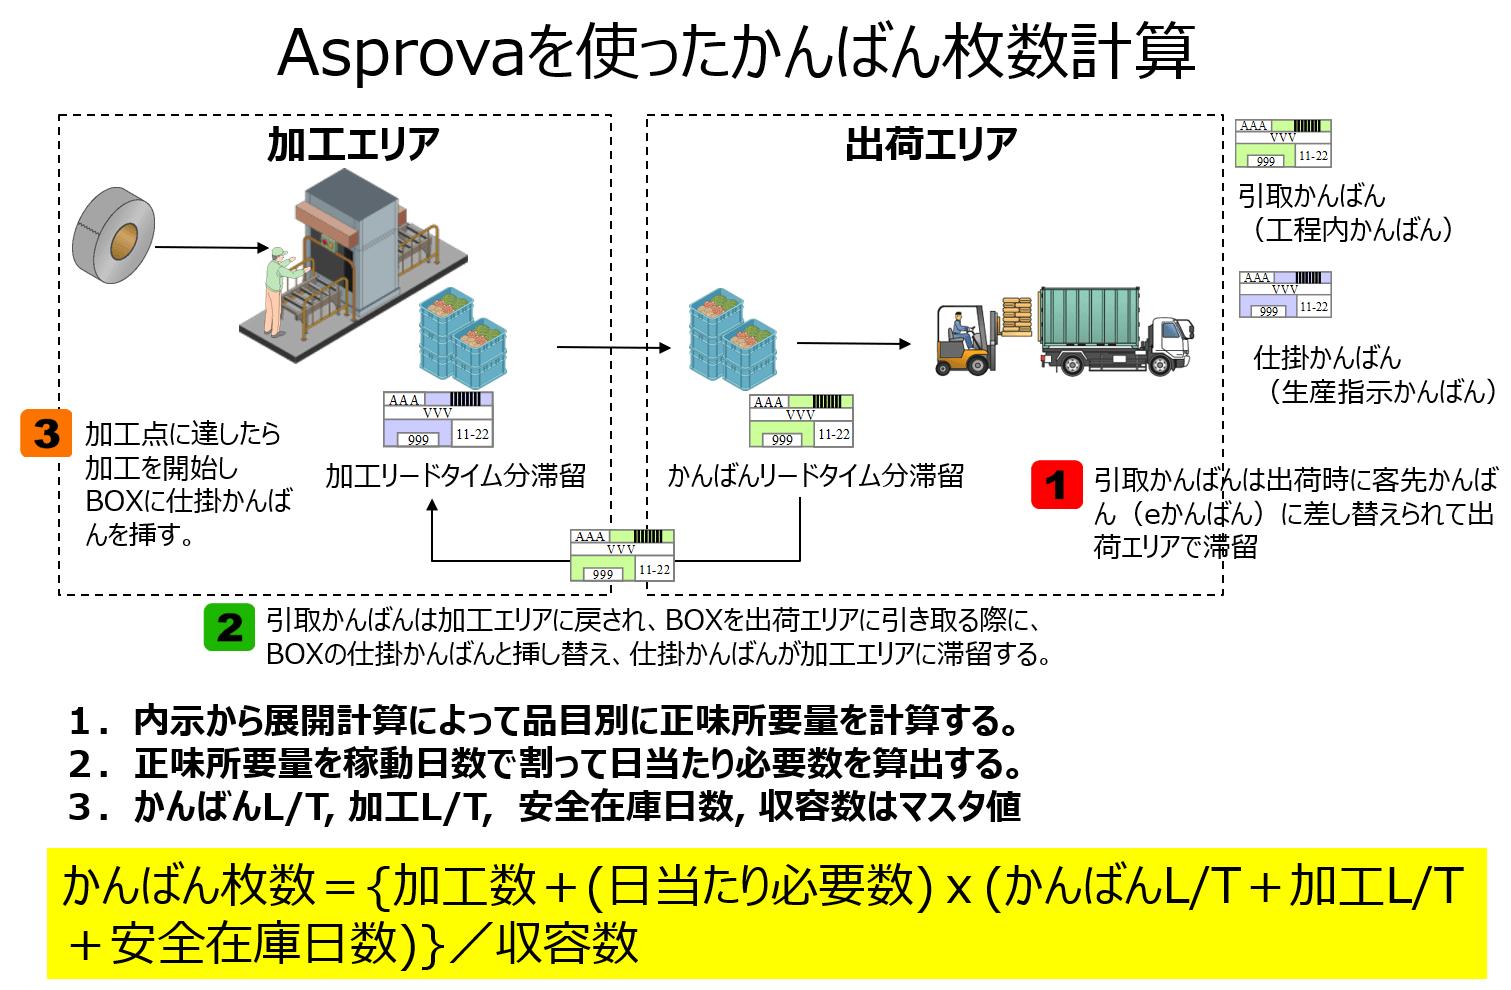 Asprovaを使ったかんばん枚数計算